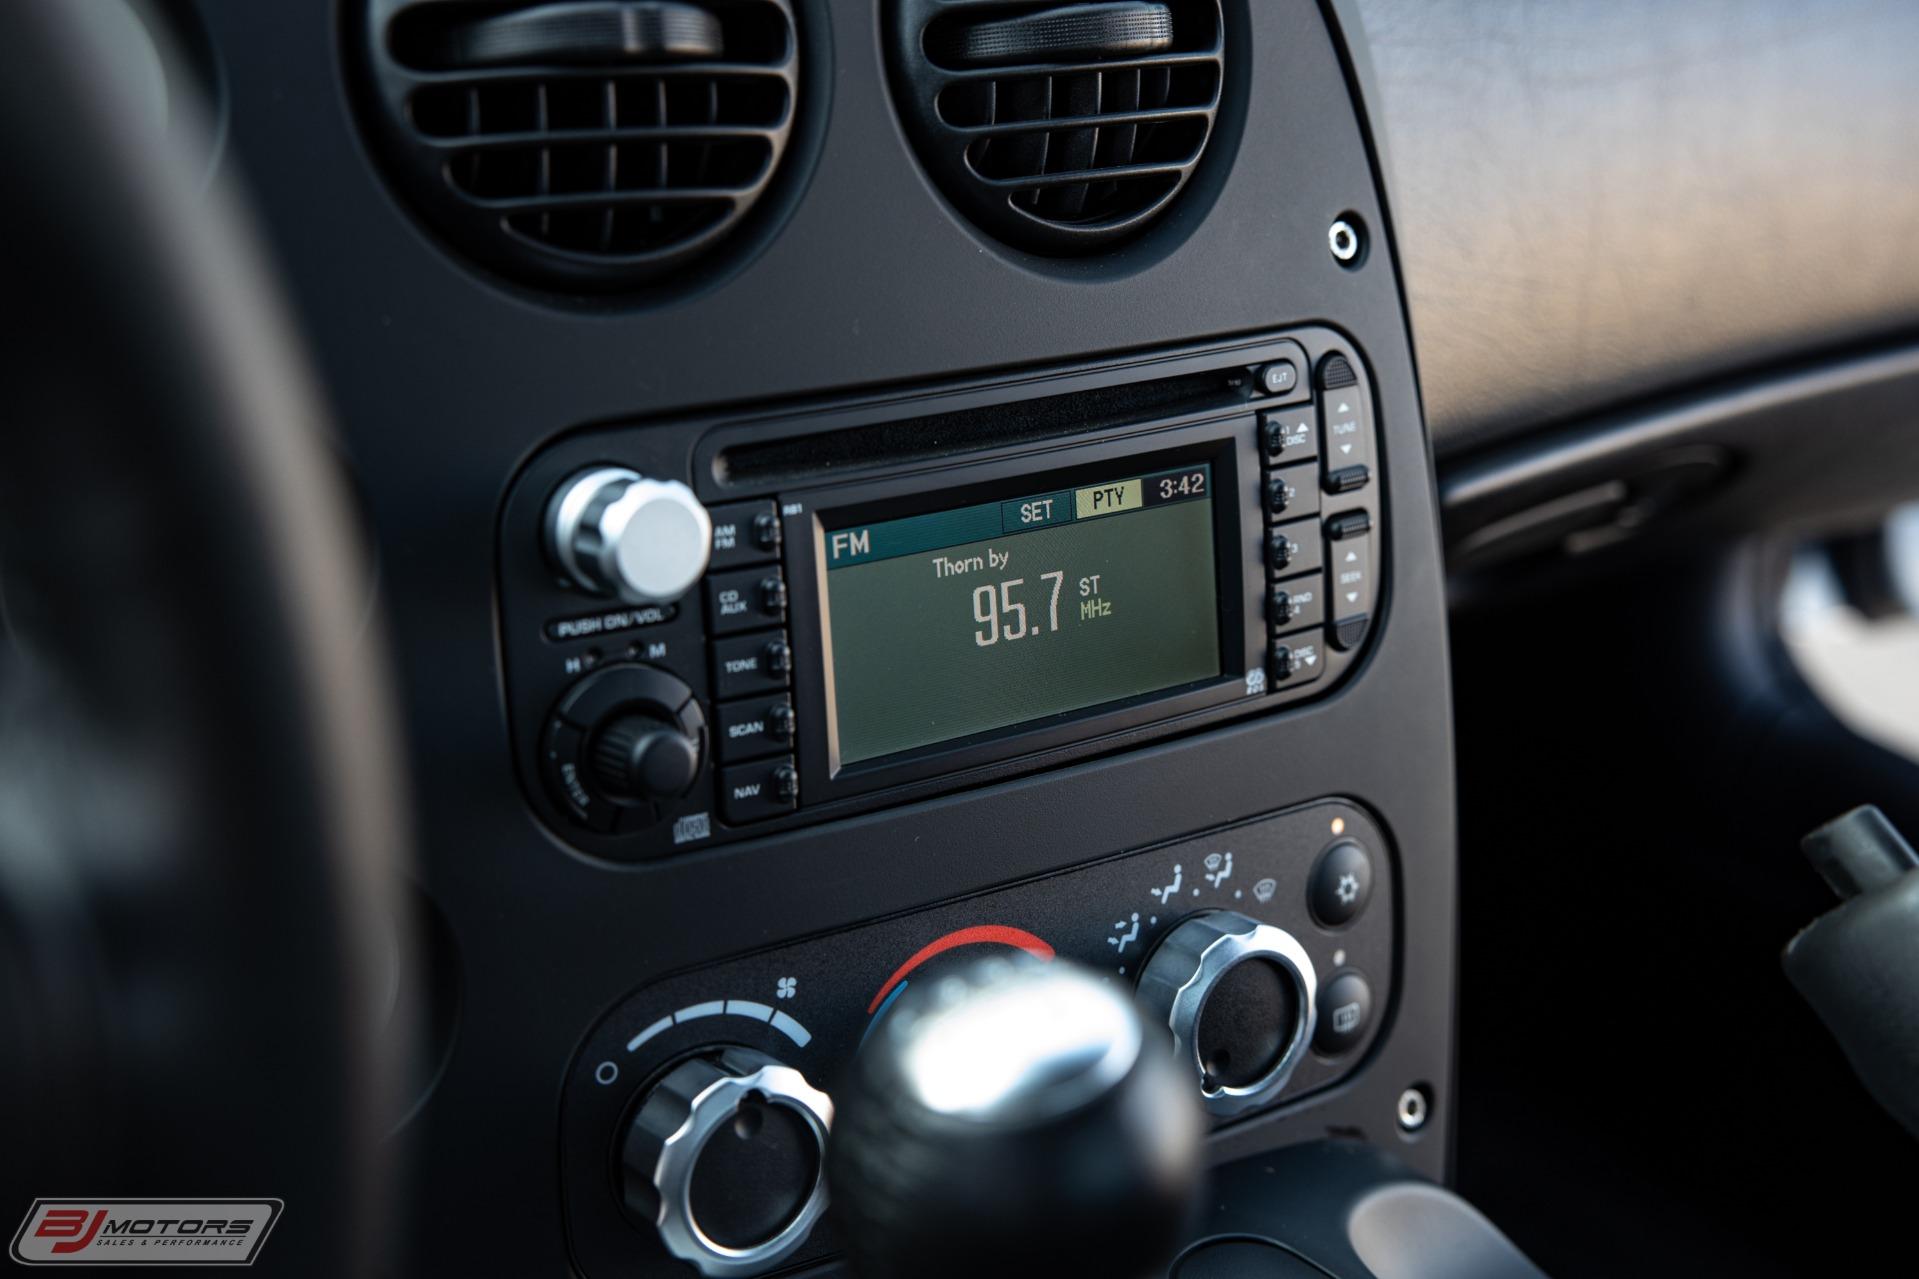 Used-2009-Dodge-Viper-ACR-VOIX-Edition